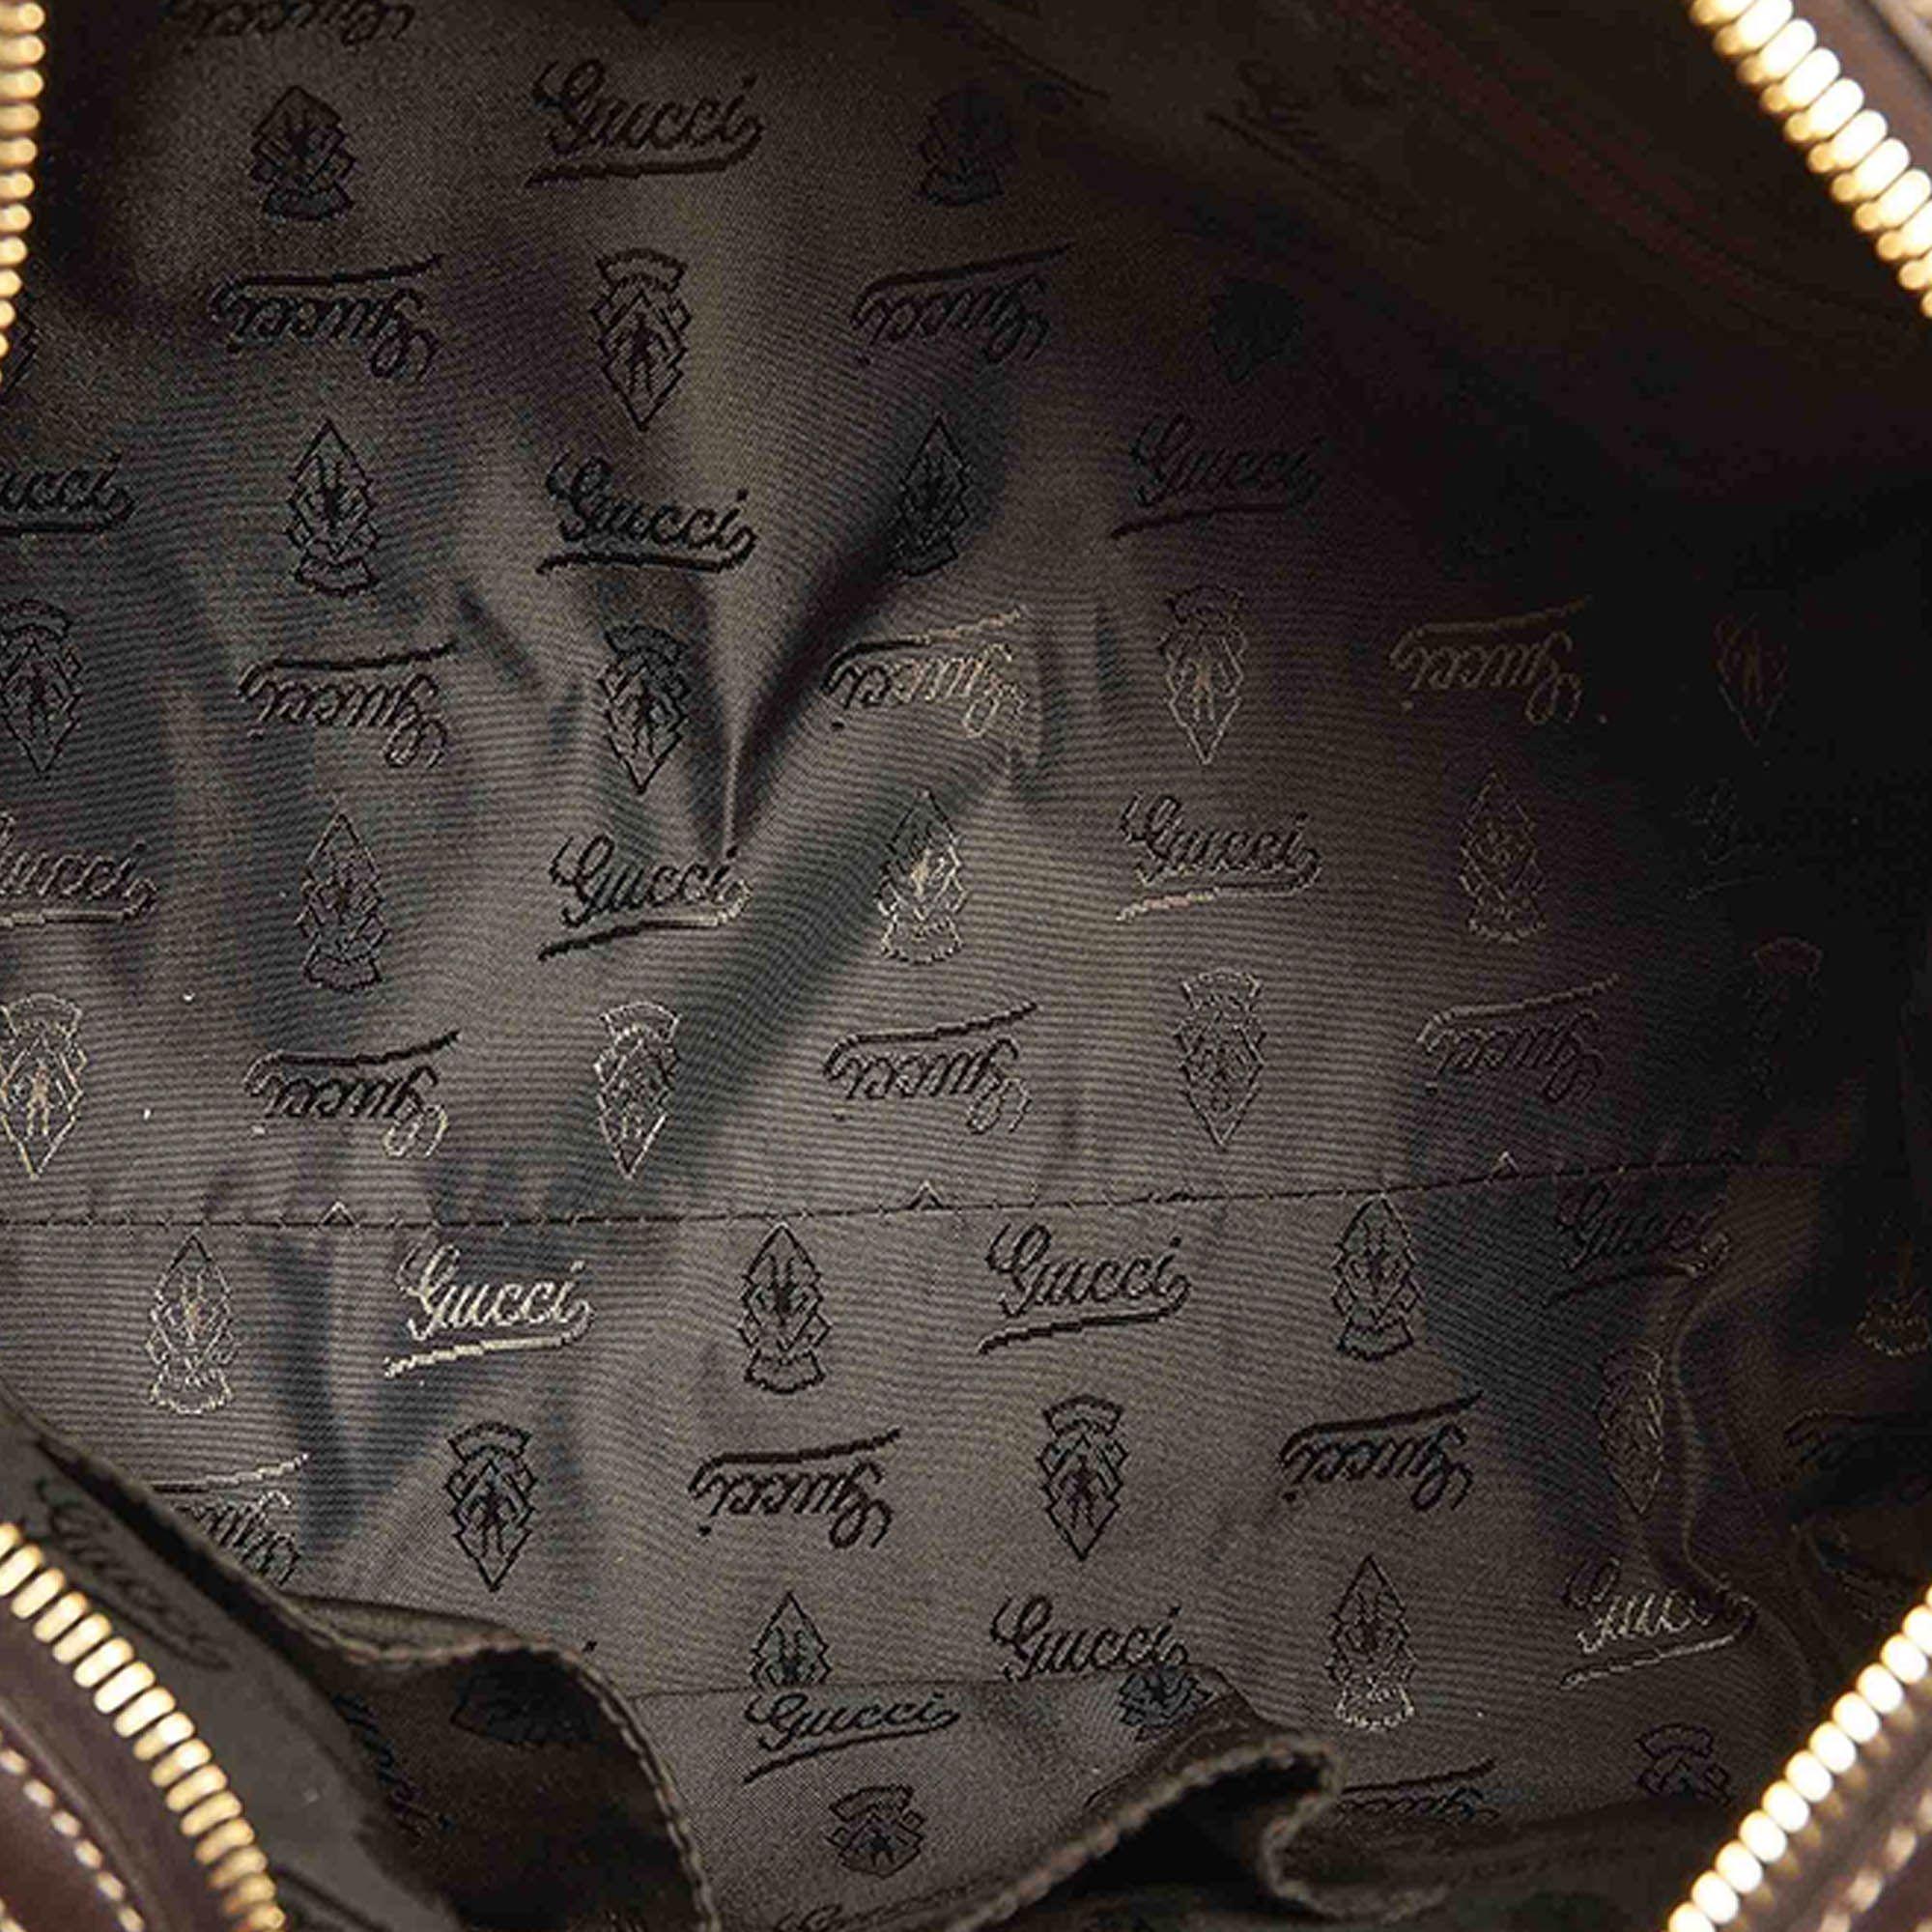 Vintage Gucci GG Crystal Duchessa Boston Bag Brown